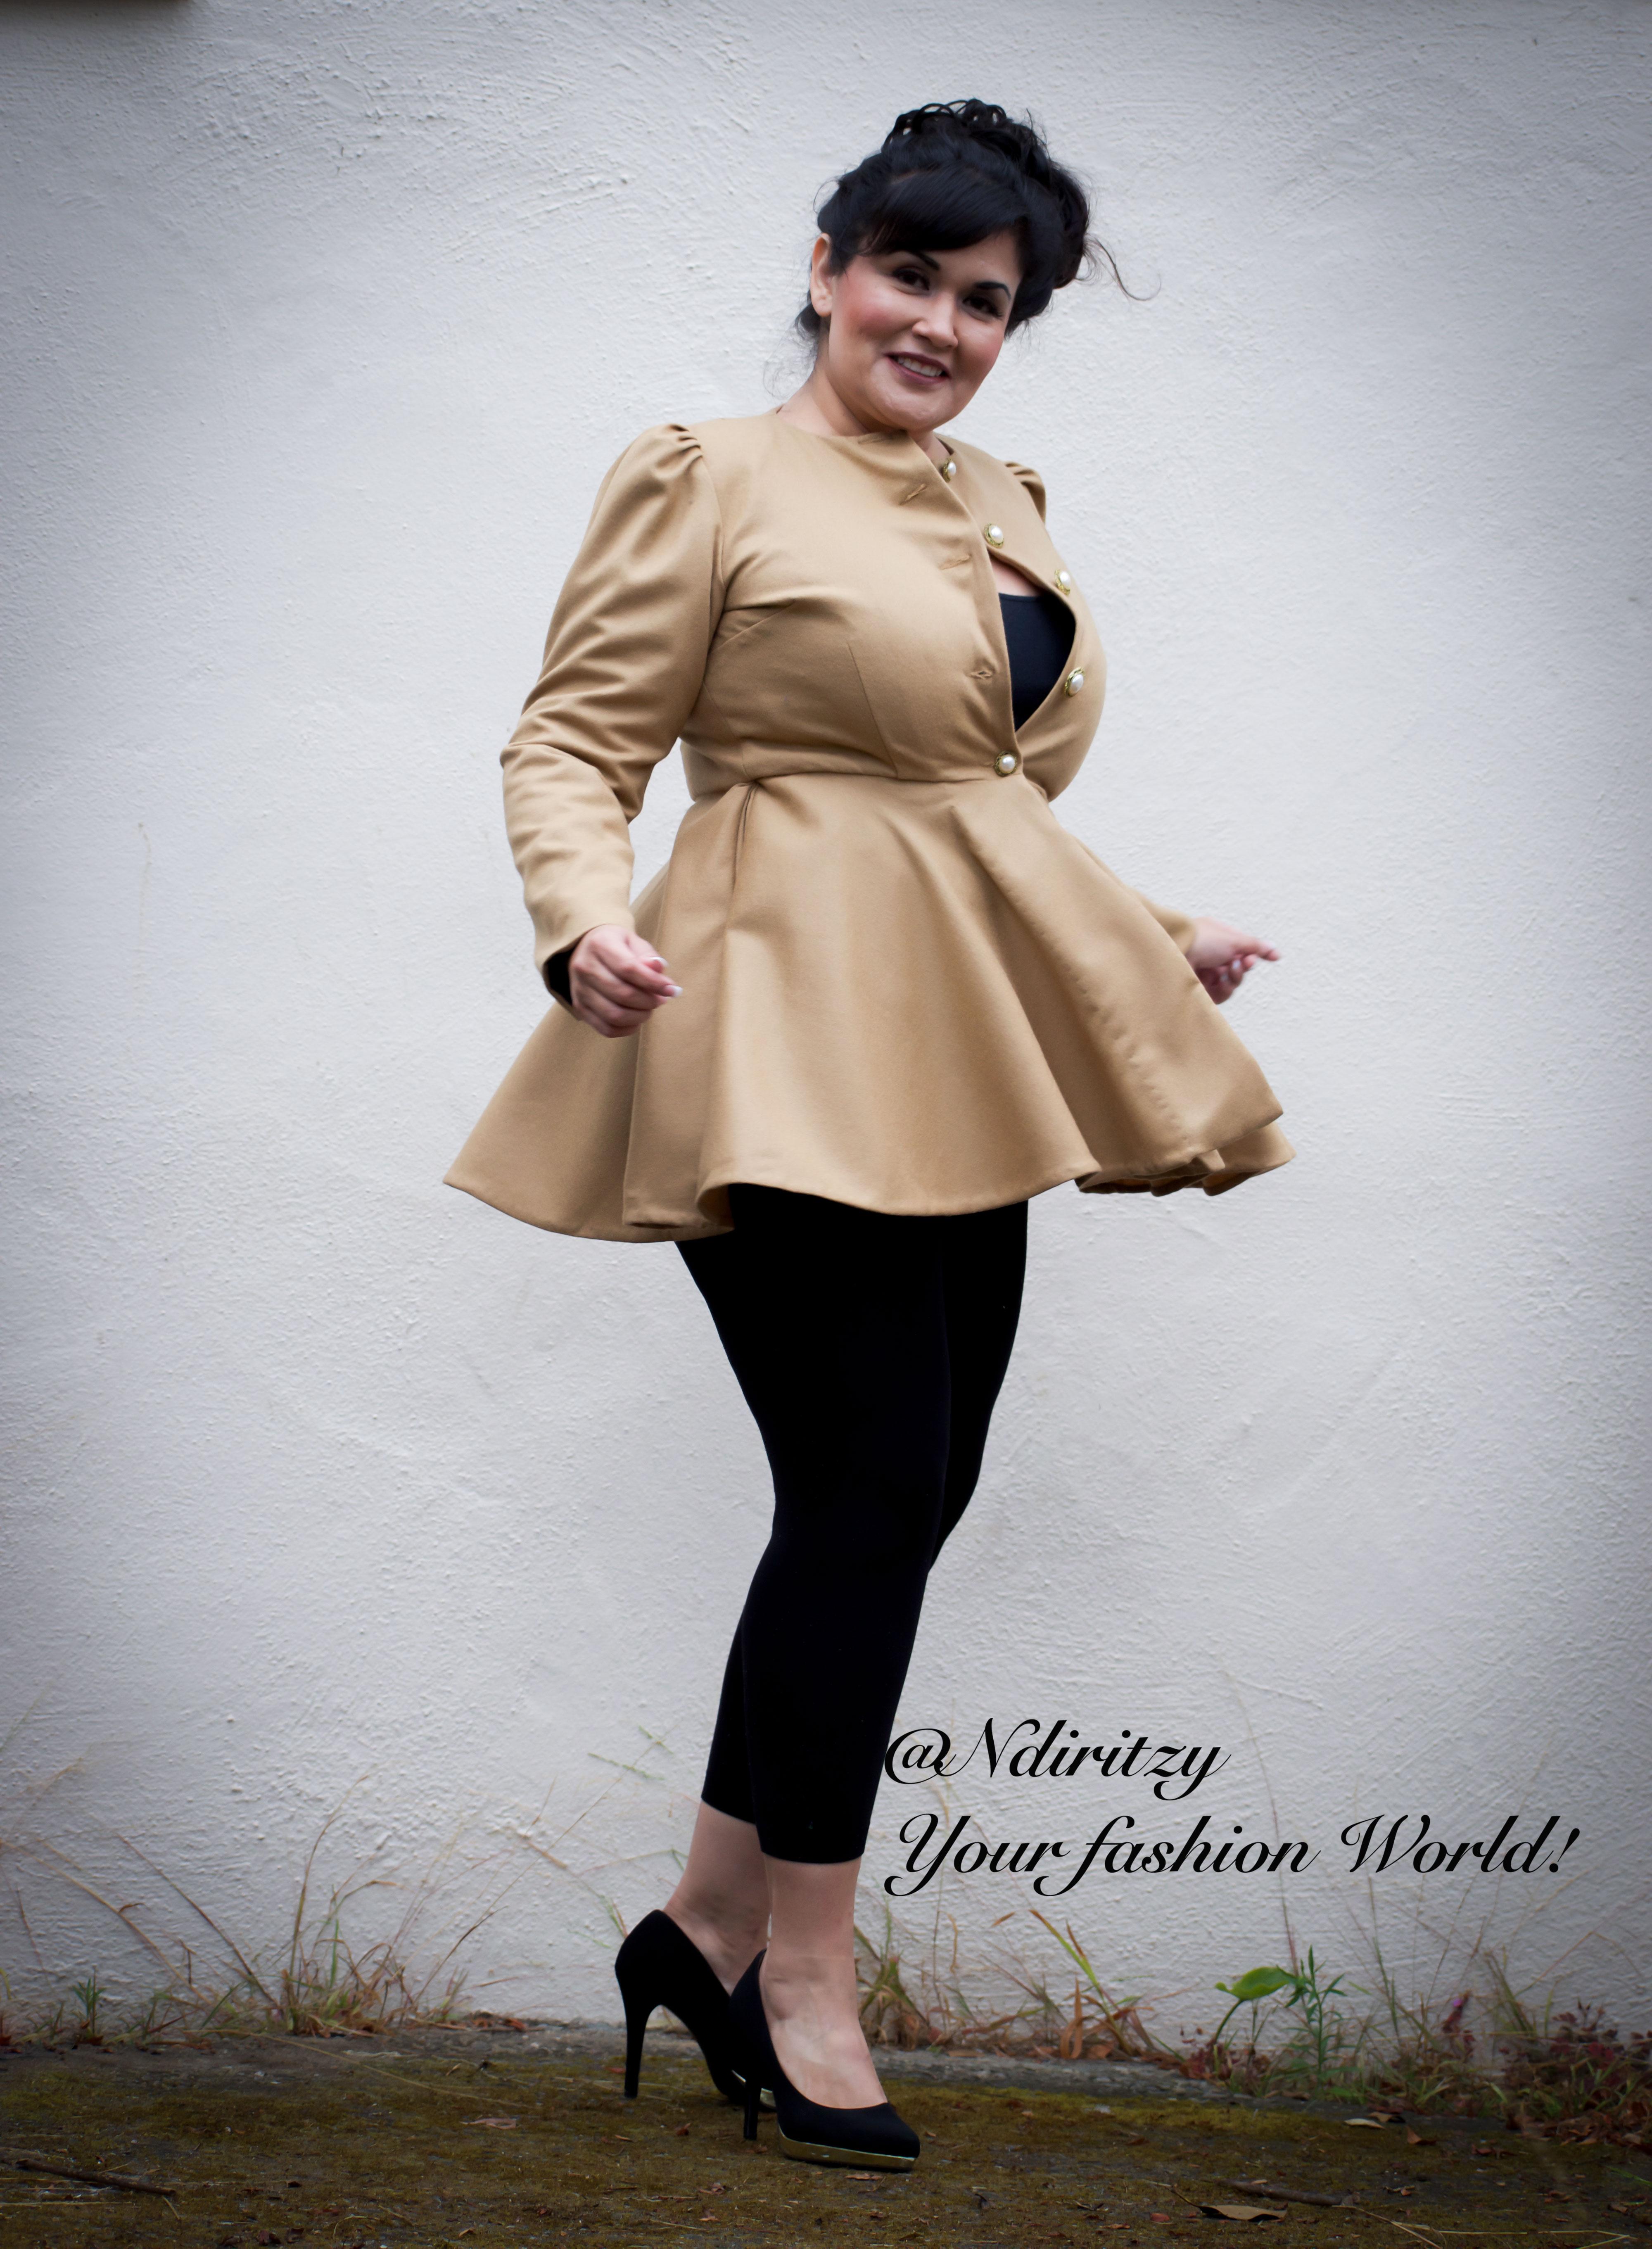 d90fc9a9a1af3 Brown flannel wool coat - NdiRitzy